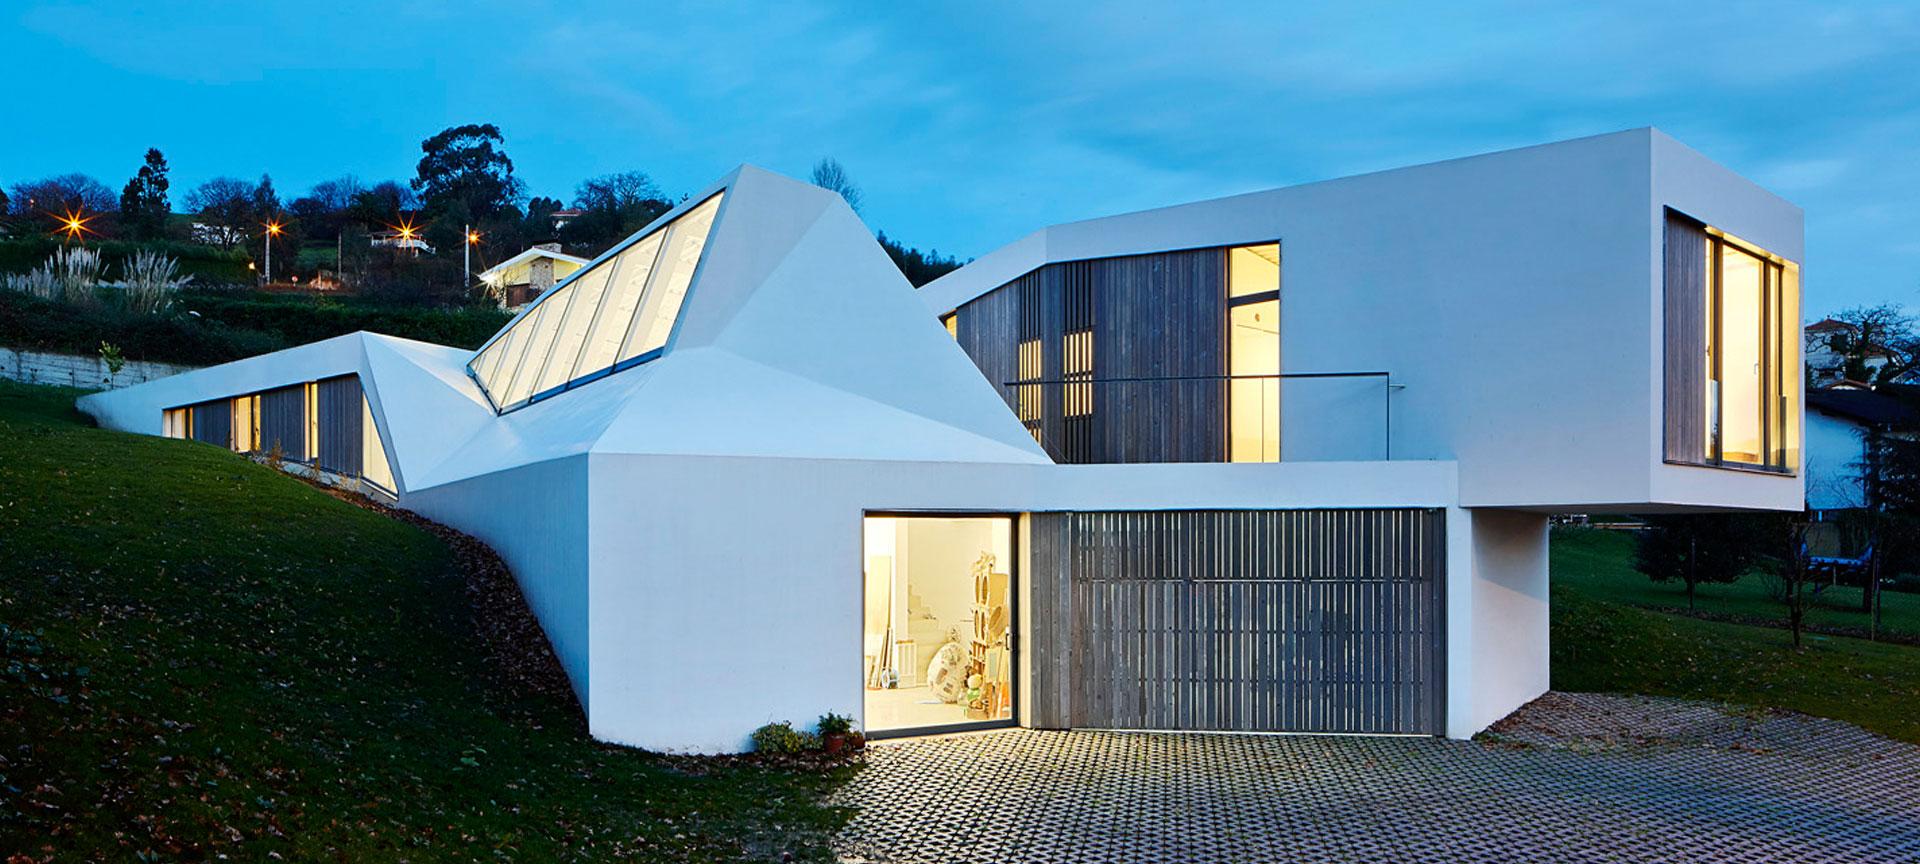 Estilos arquitect nicos selecta home for Estilos arquitectonicos contemporaneos